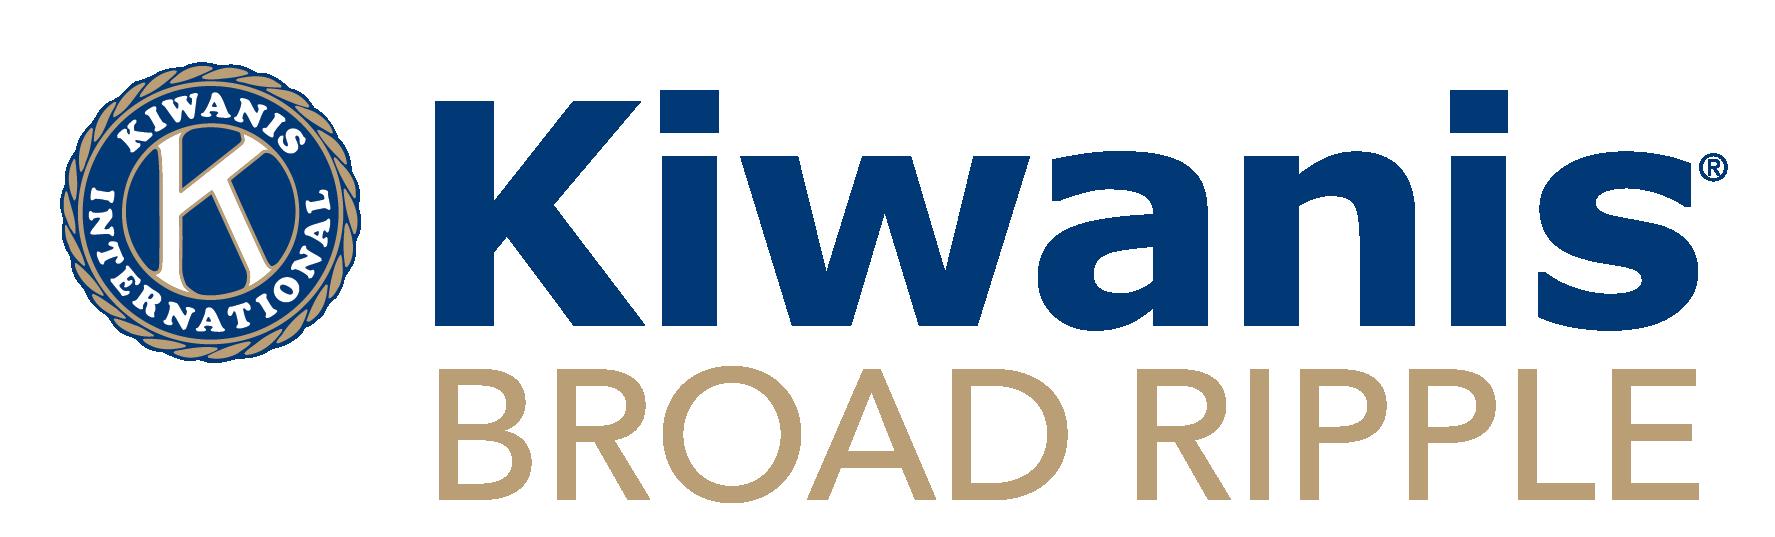 Broad Ripple Kiwanis.png